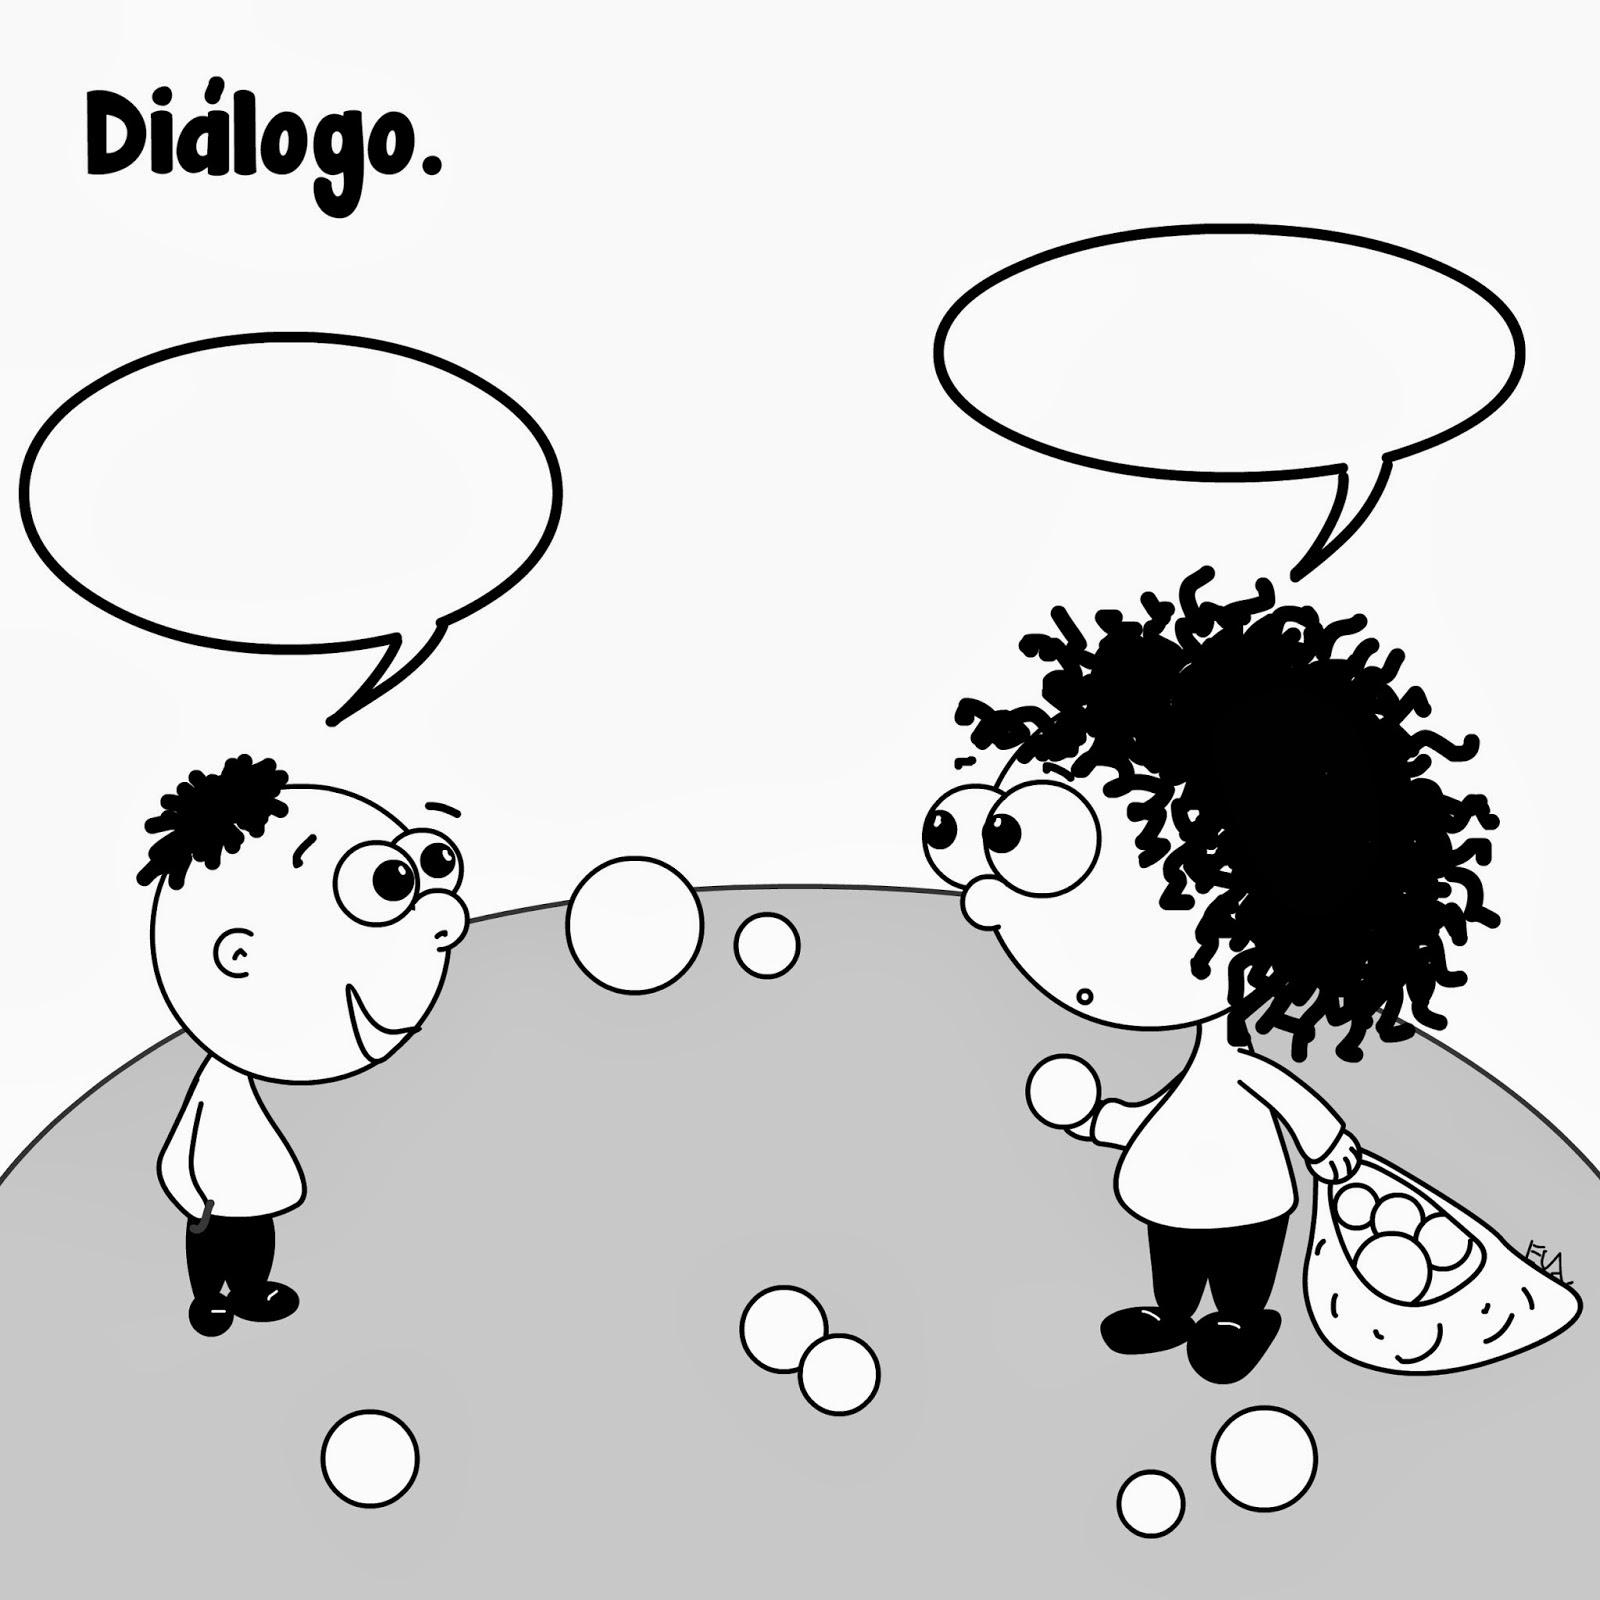 AprenDibus de Campanilla.: El lenguaje del cómic.